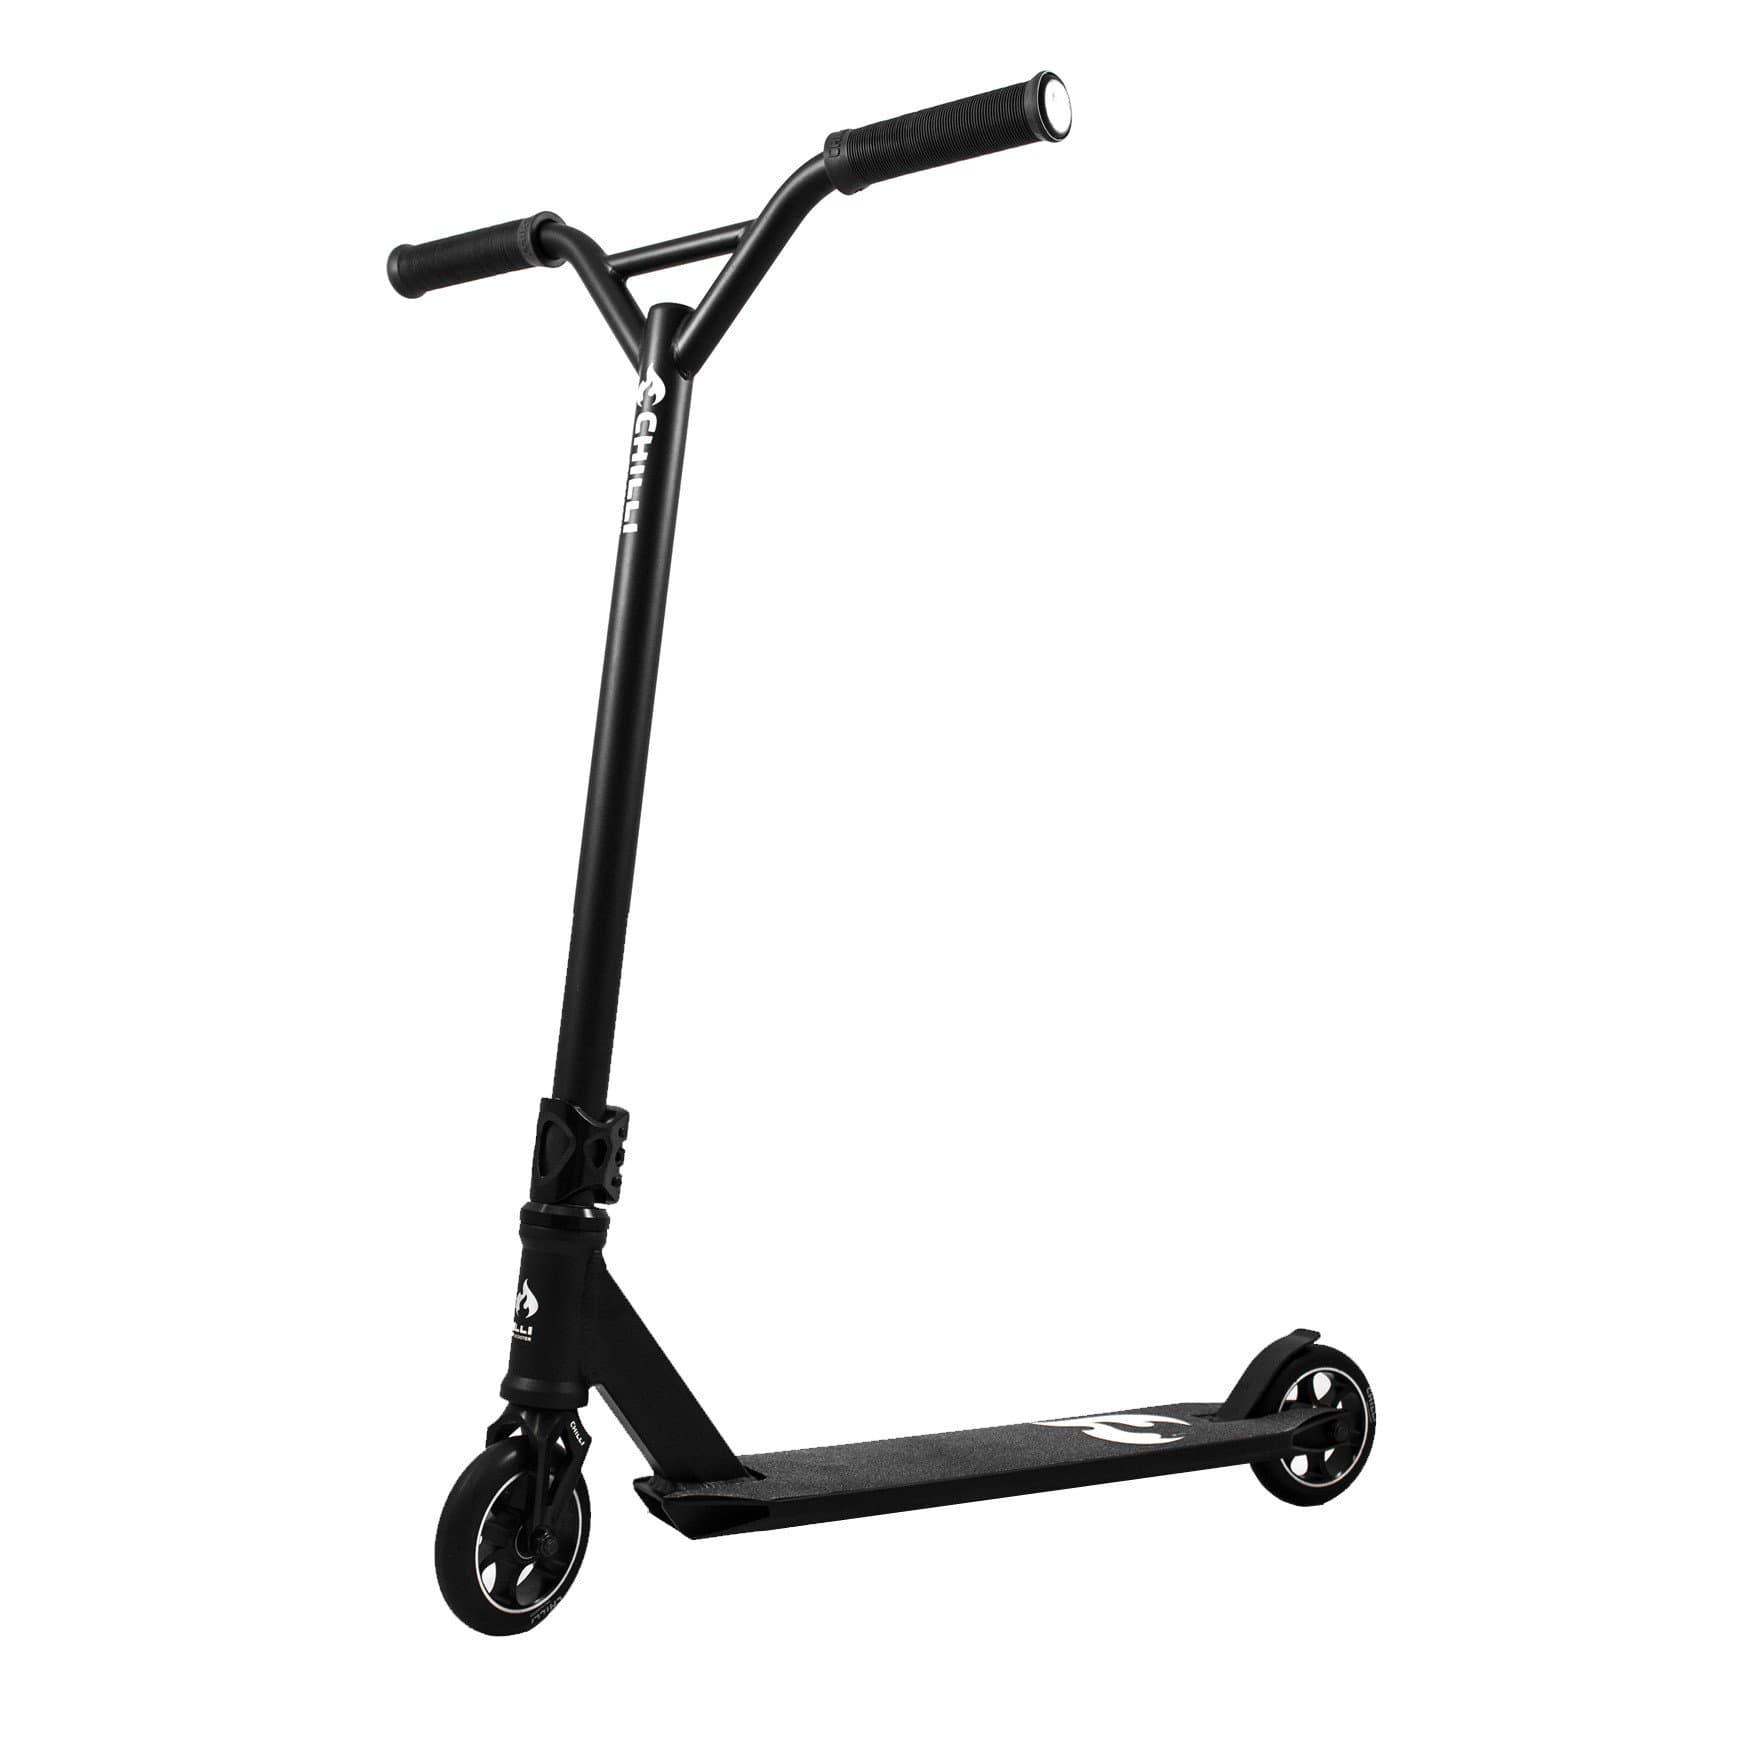 chilli pro 5000 all black stunt scooter migros. Black Bedroom Furniture Sets. Home Design Ideas